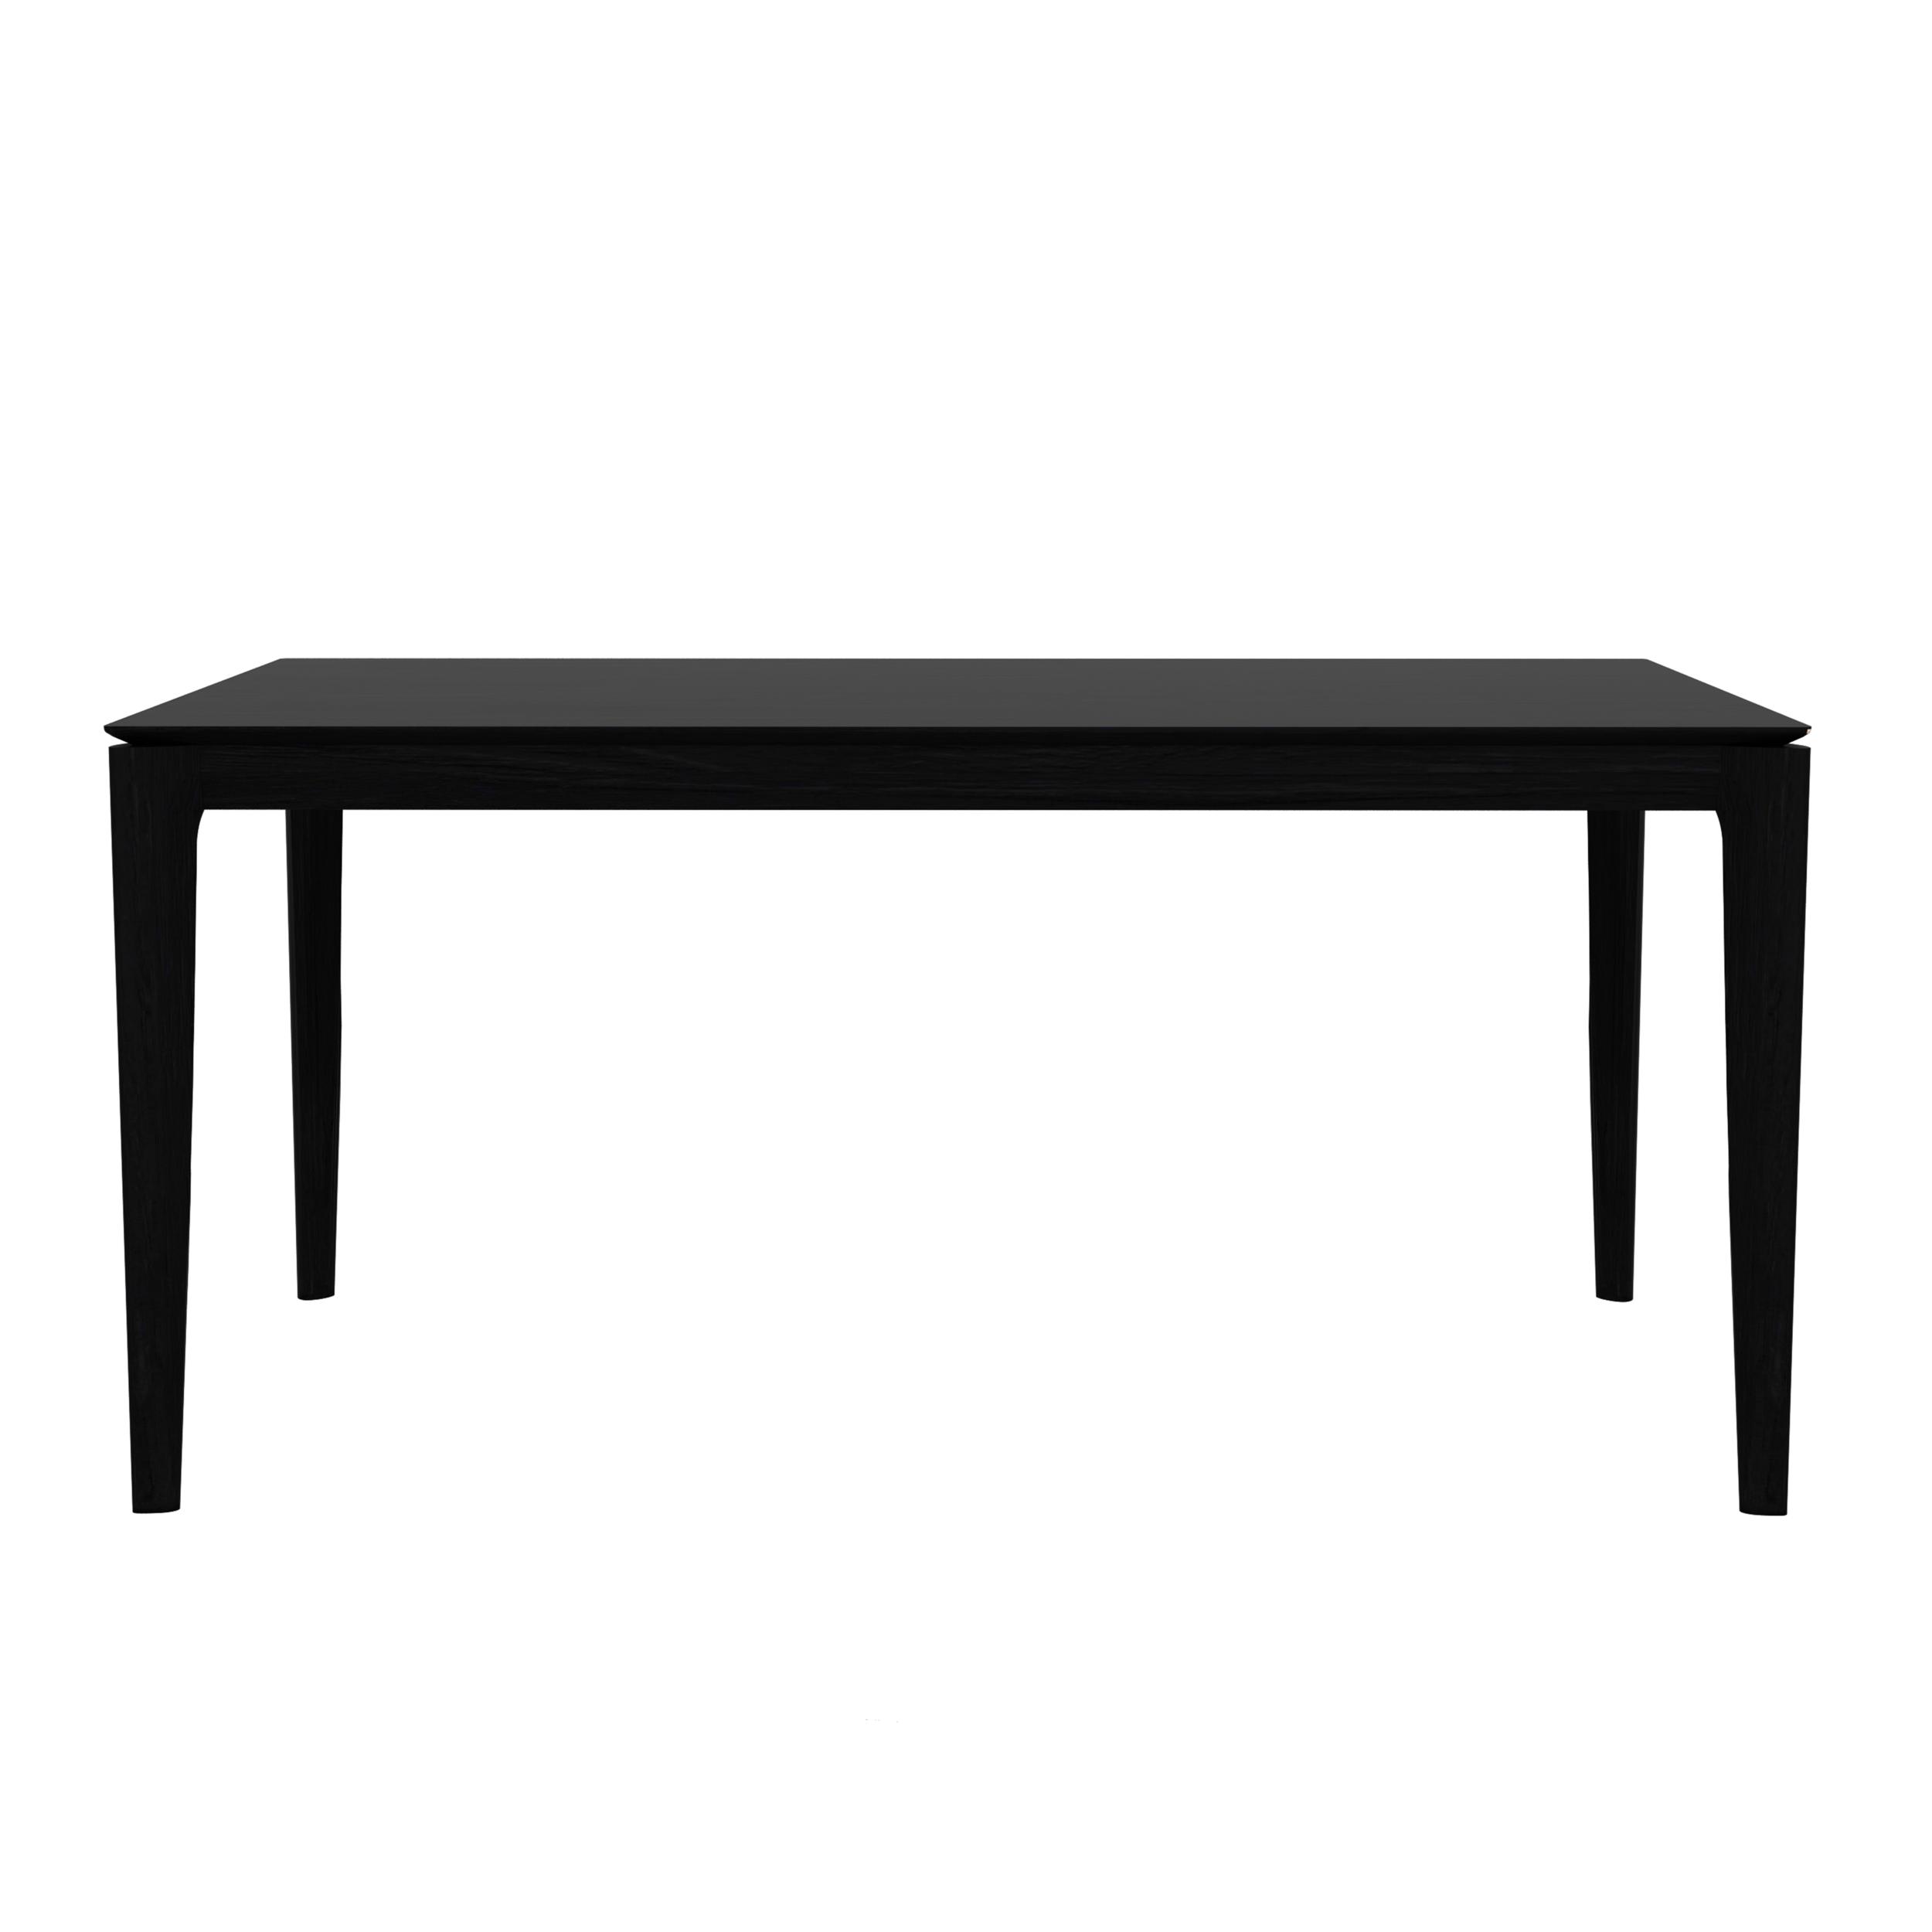 51505 Bok dining table - Oak black.jpg.png